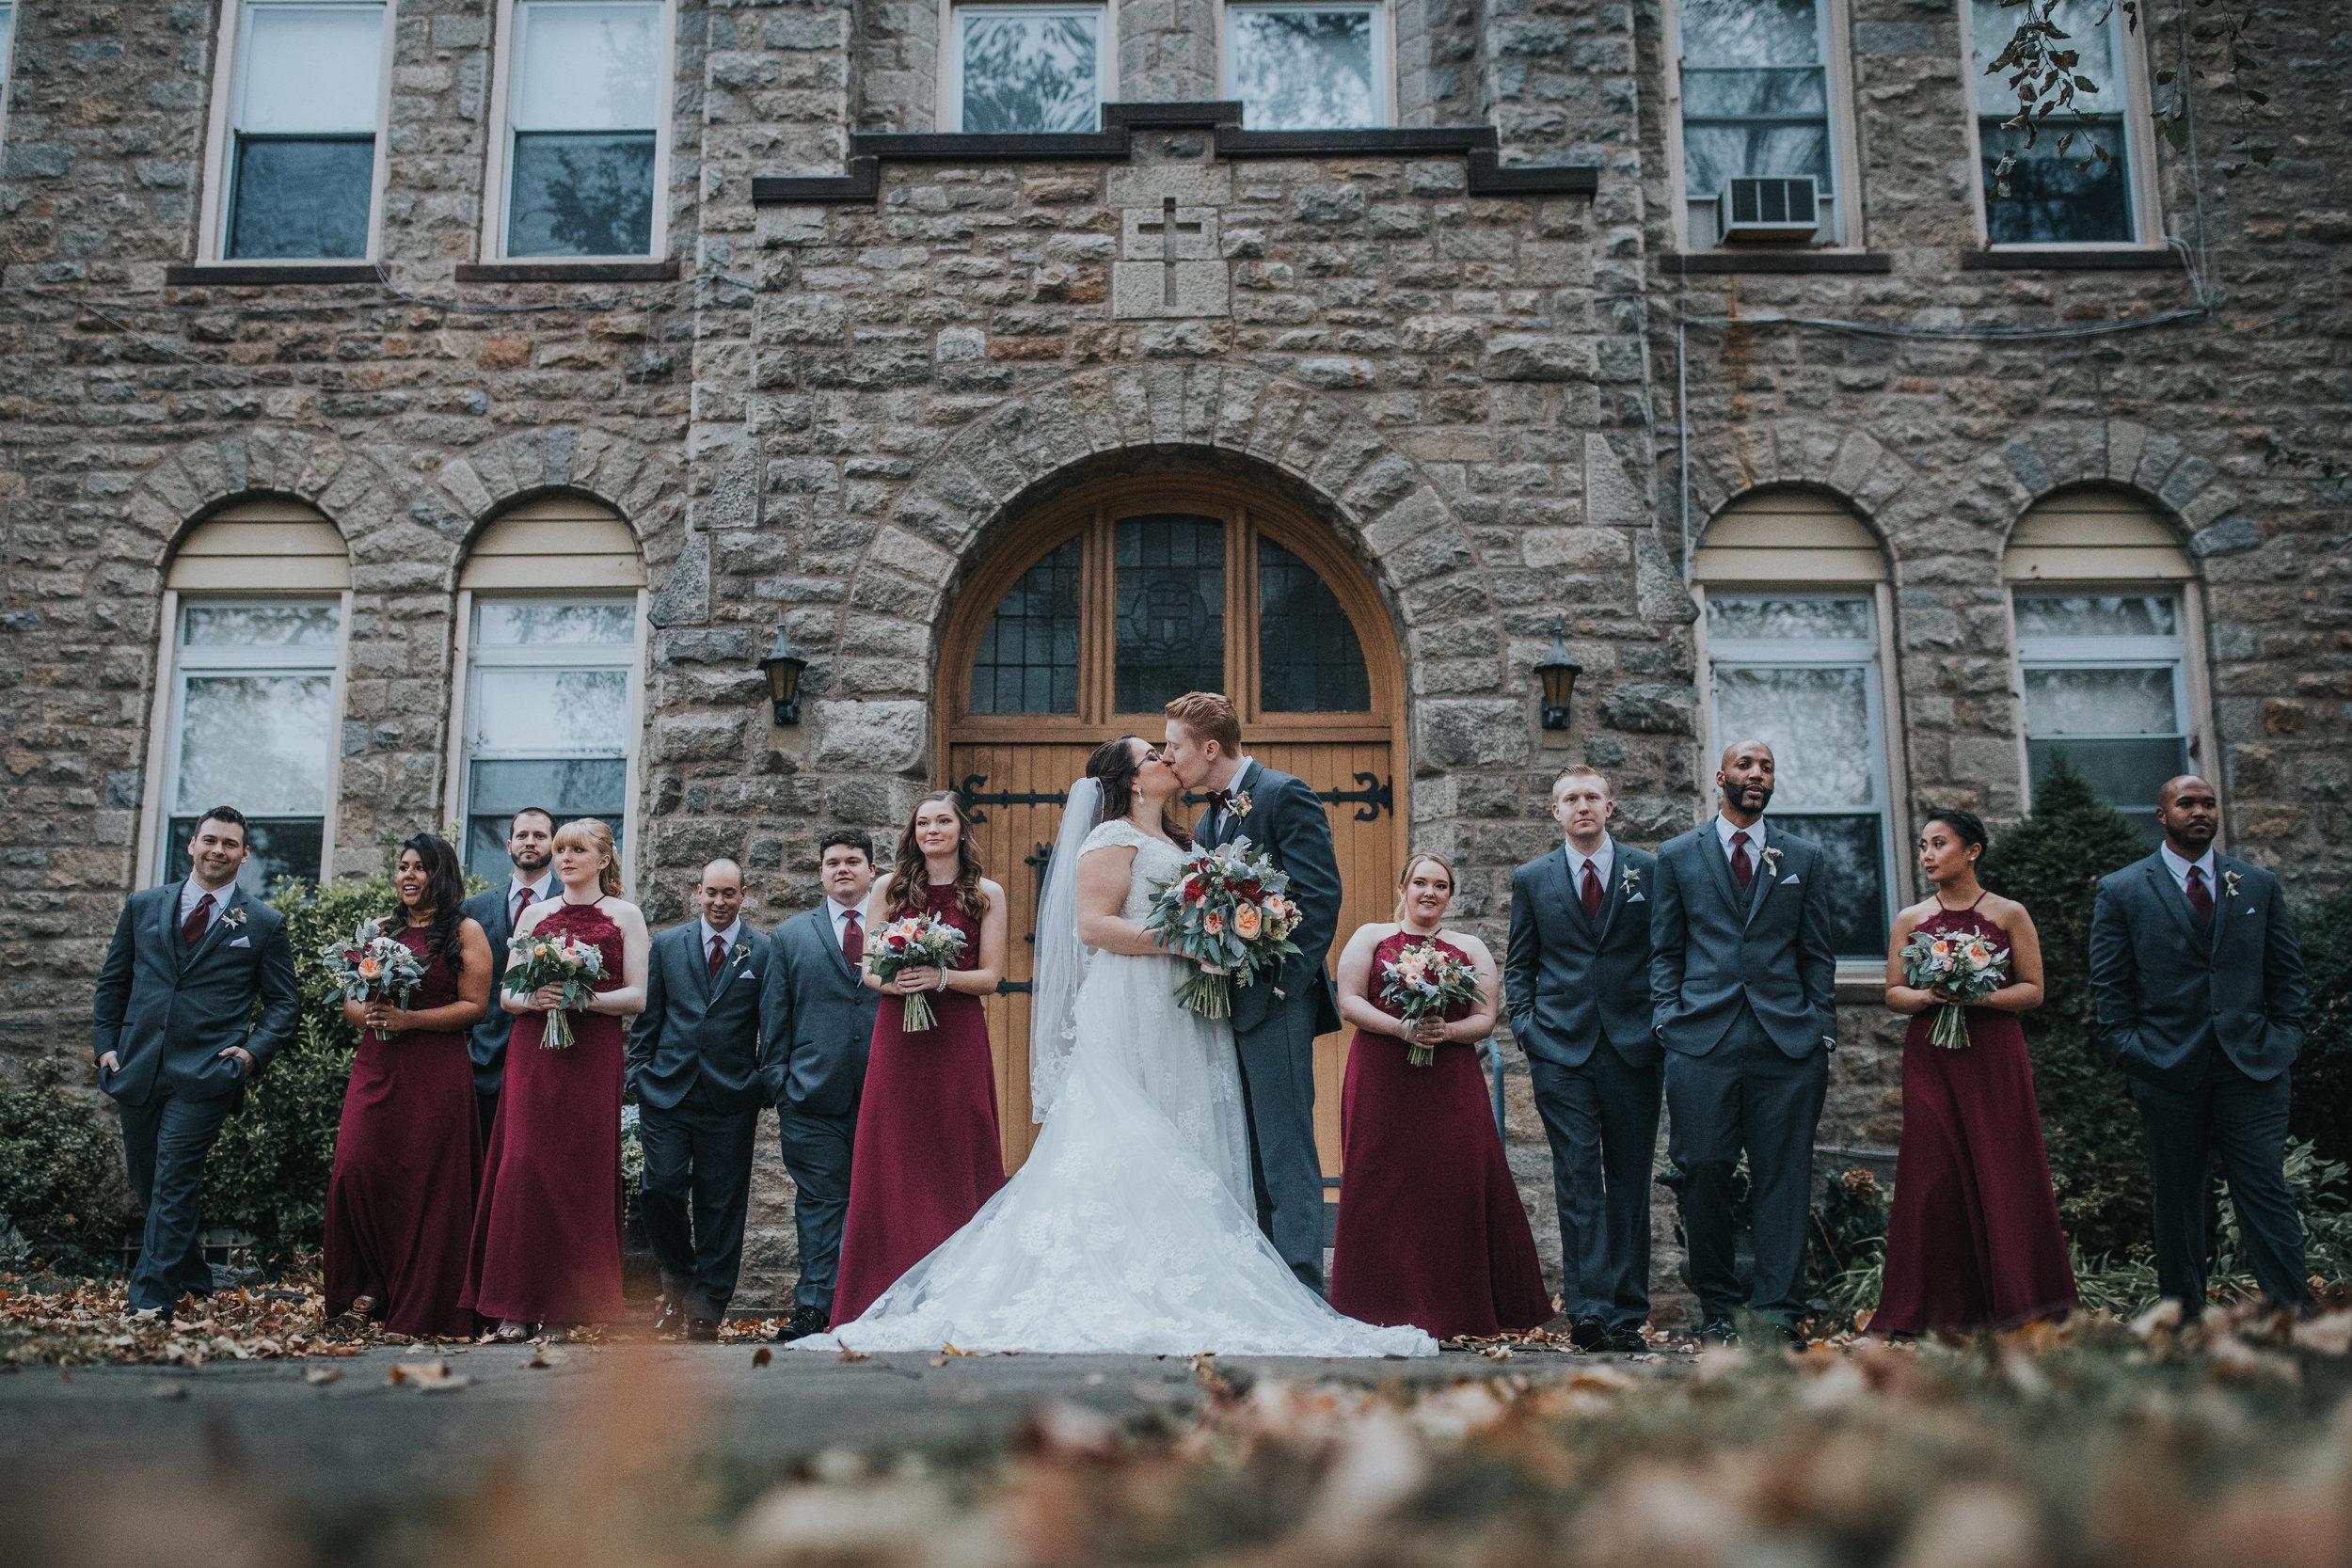 New-Jersey-Wedding-Photography-Fishers-Tudor-House-JennaLynnPhotography-BridalParty-Kathleen&Eddie-4.jpg